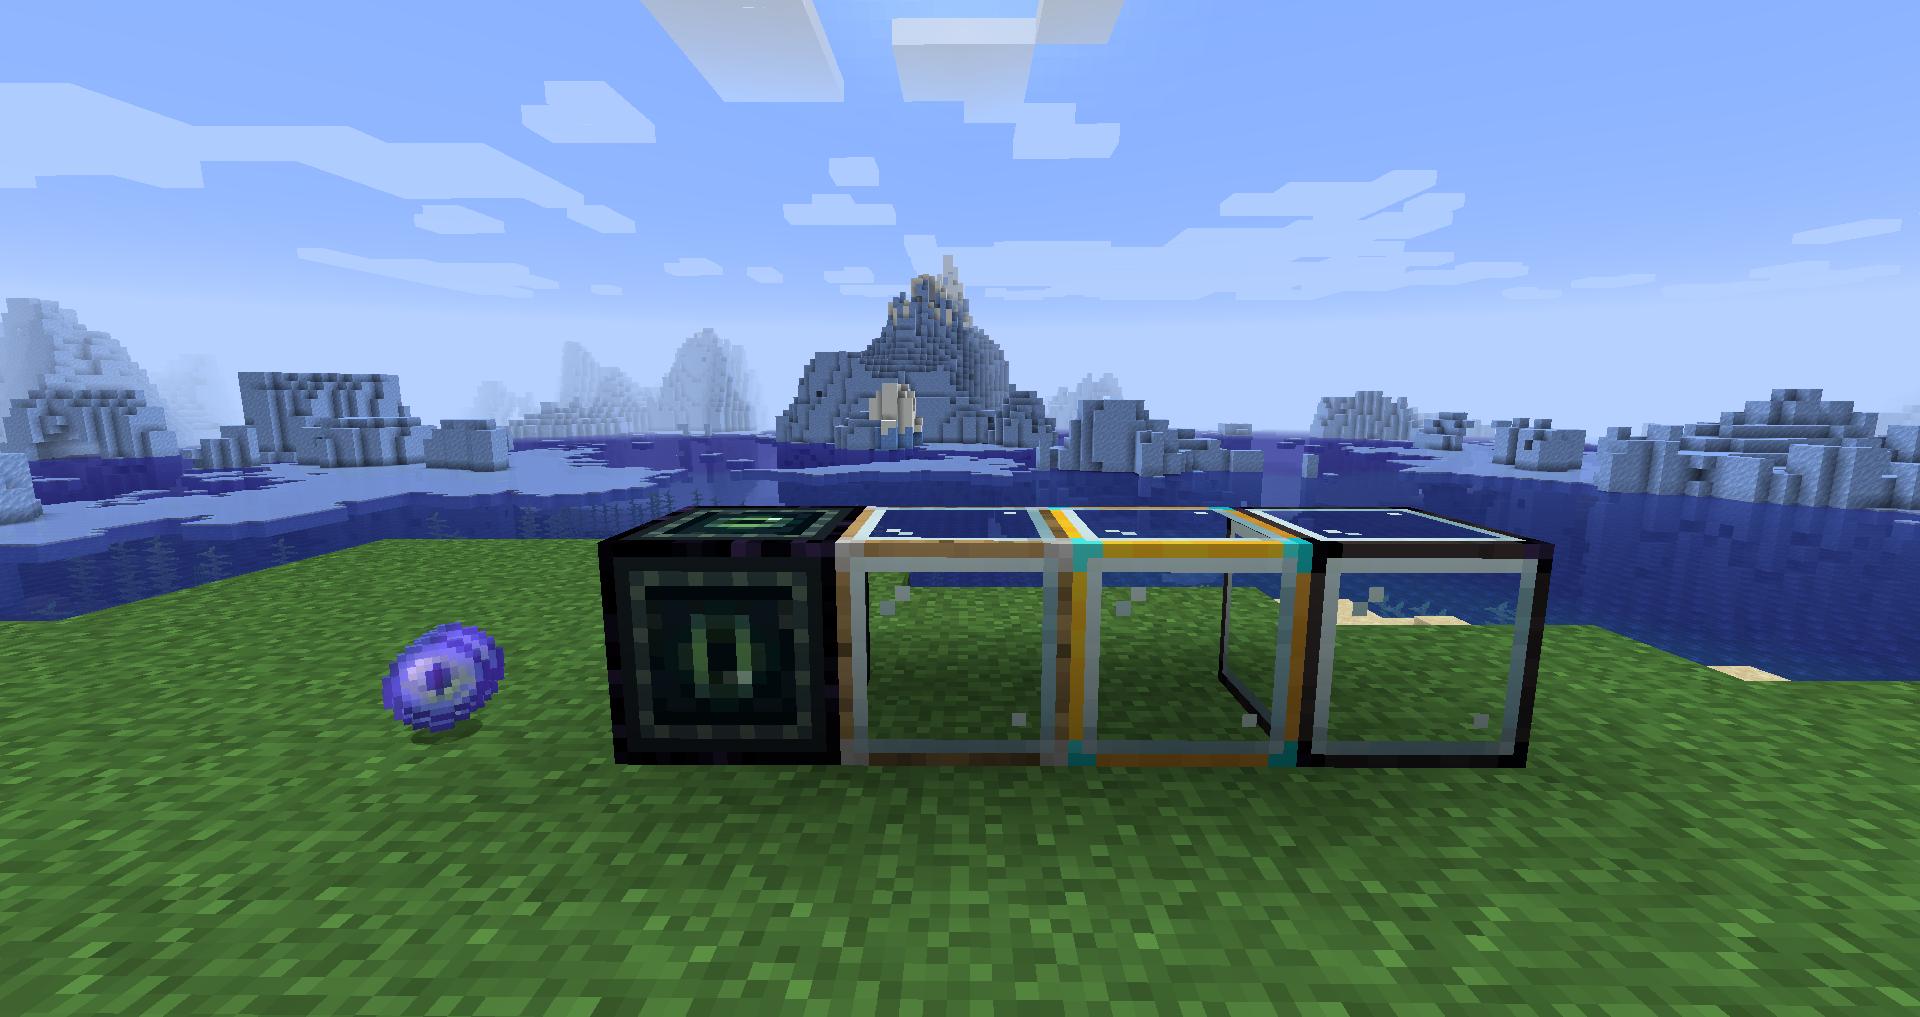 Blocks and items